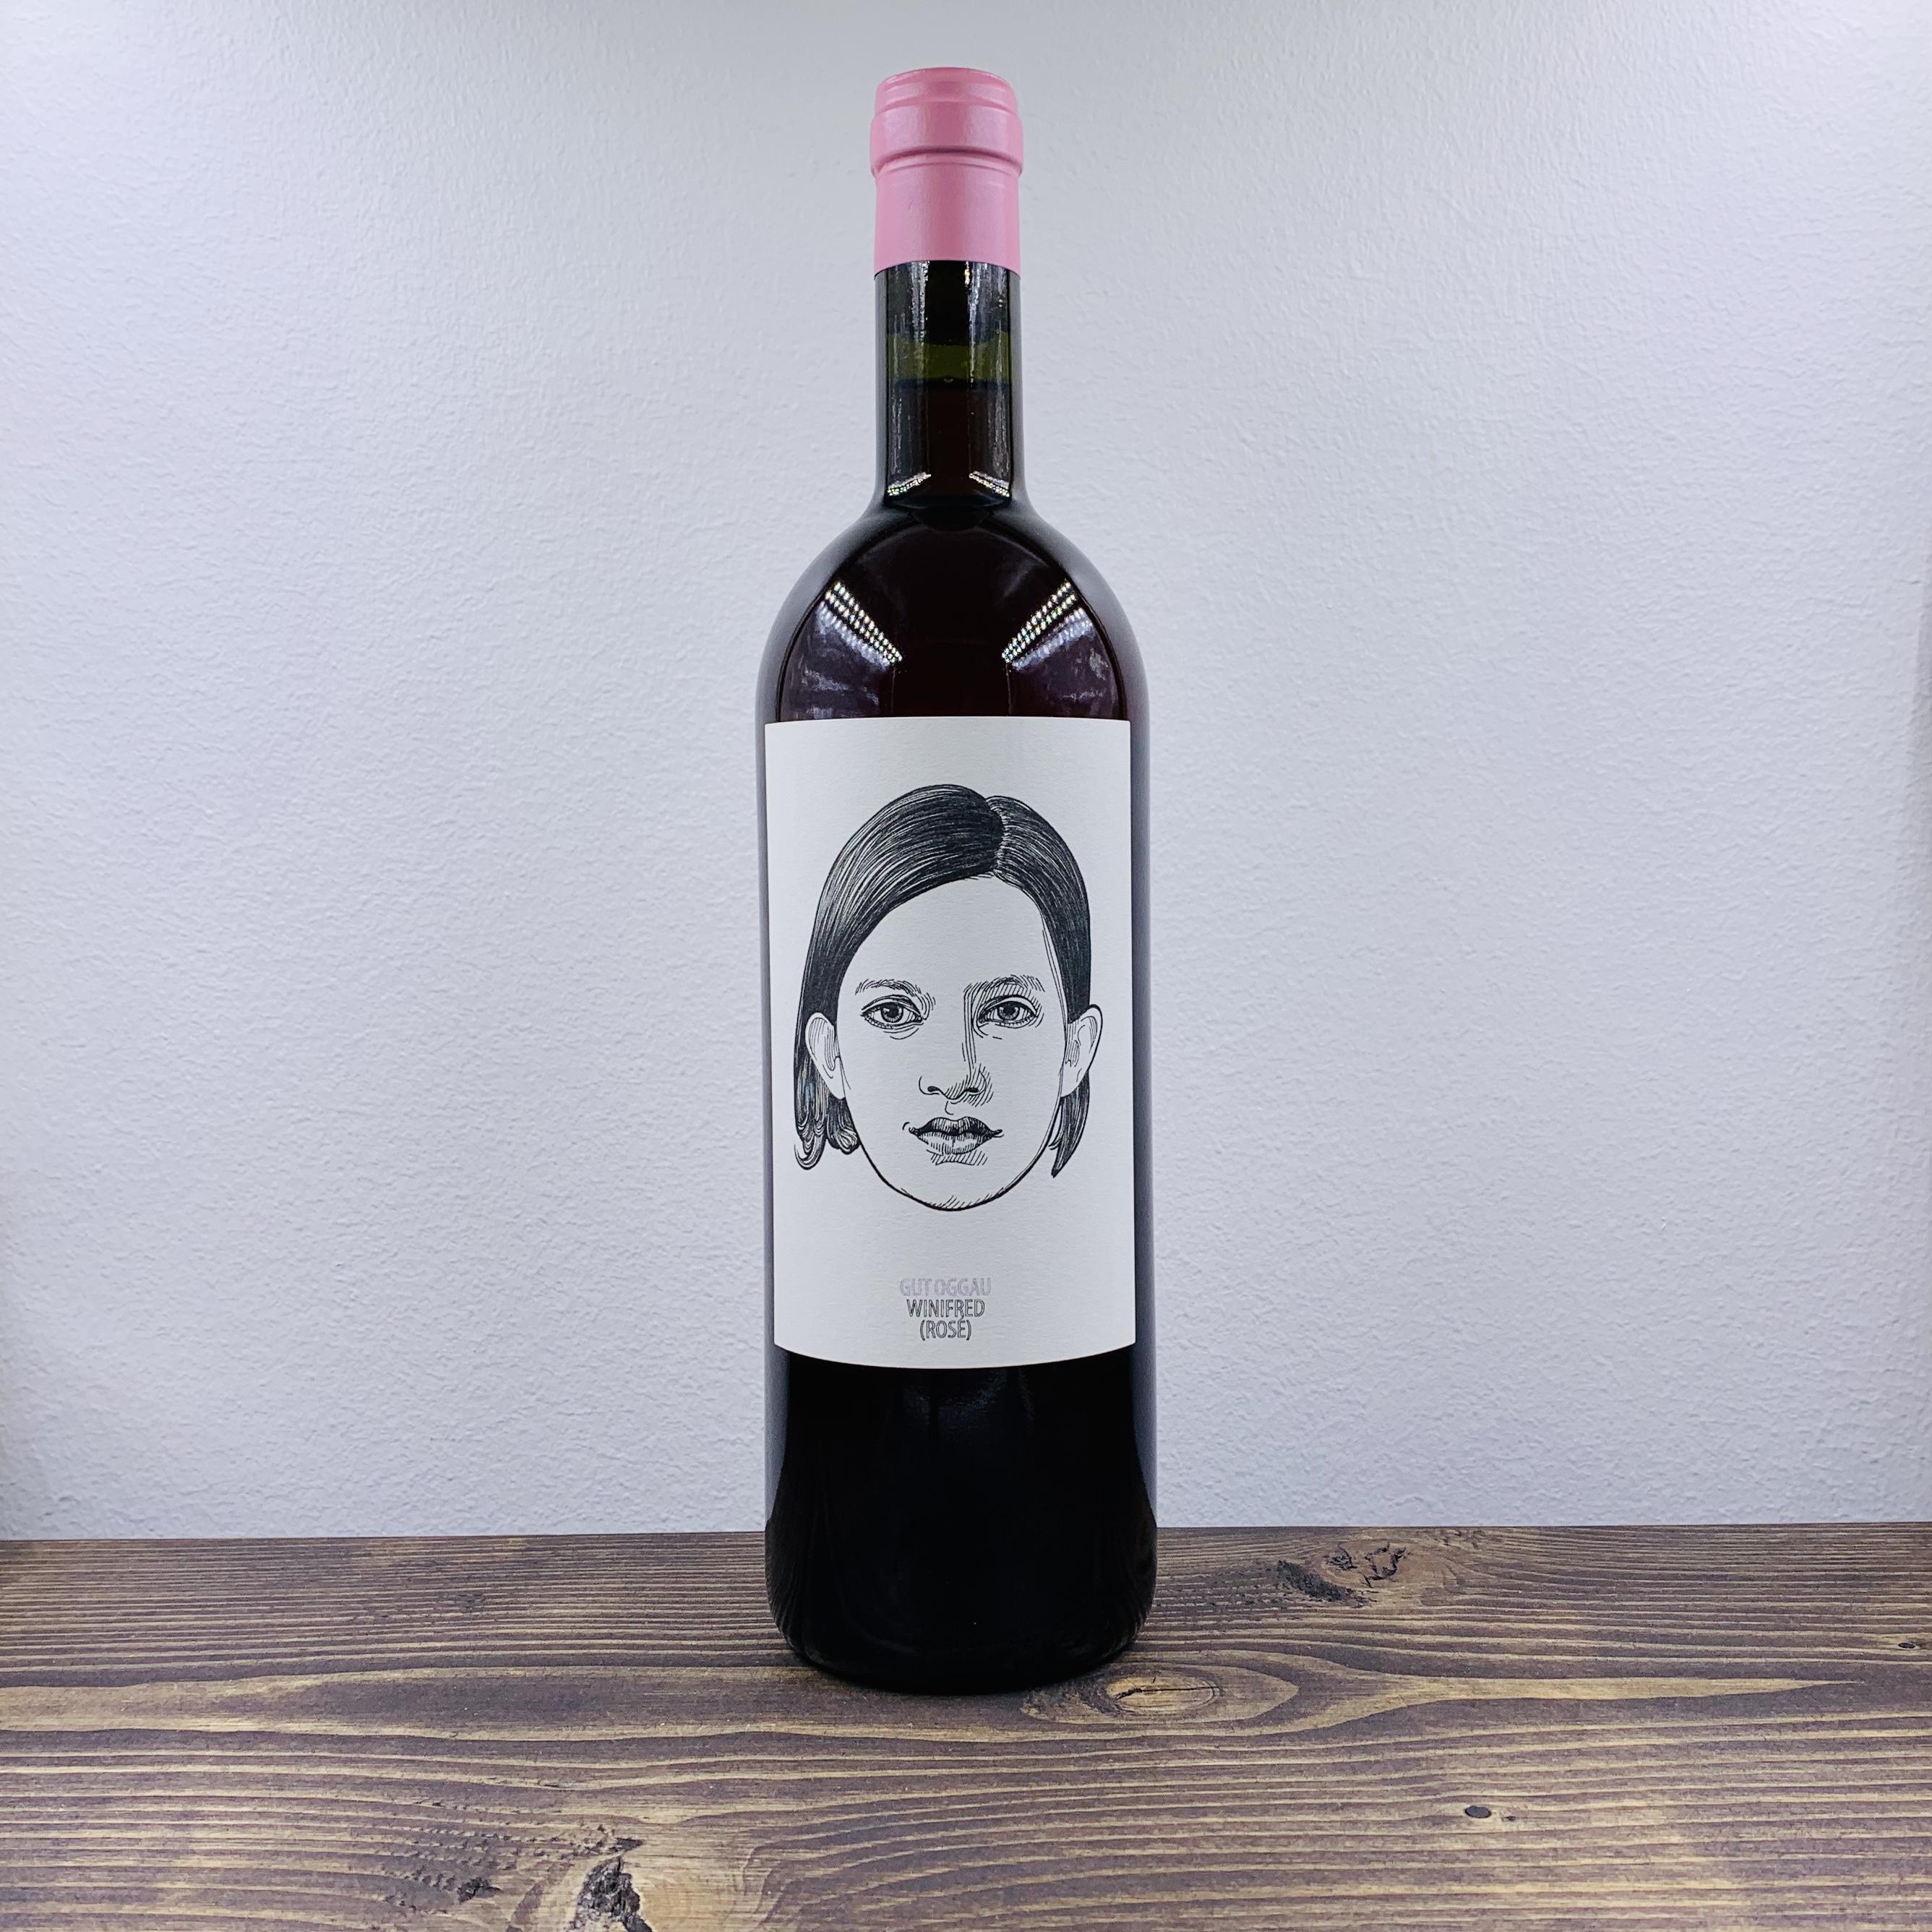 Gut Oggau Winifred Rosé 2018